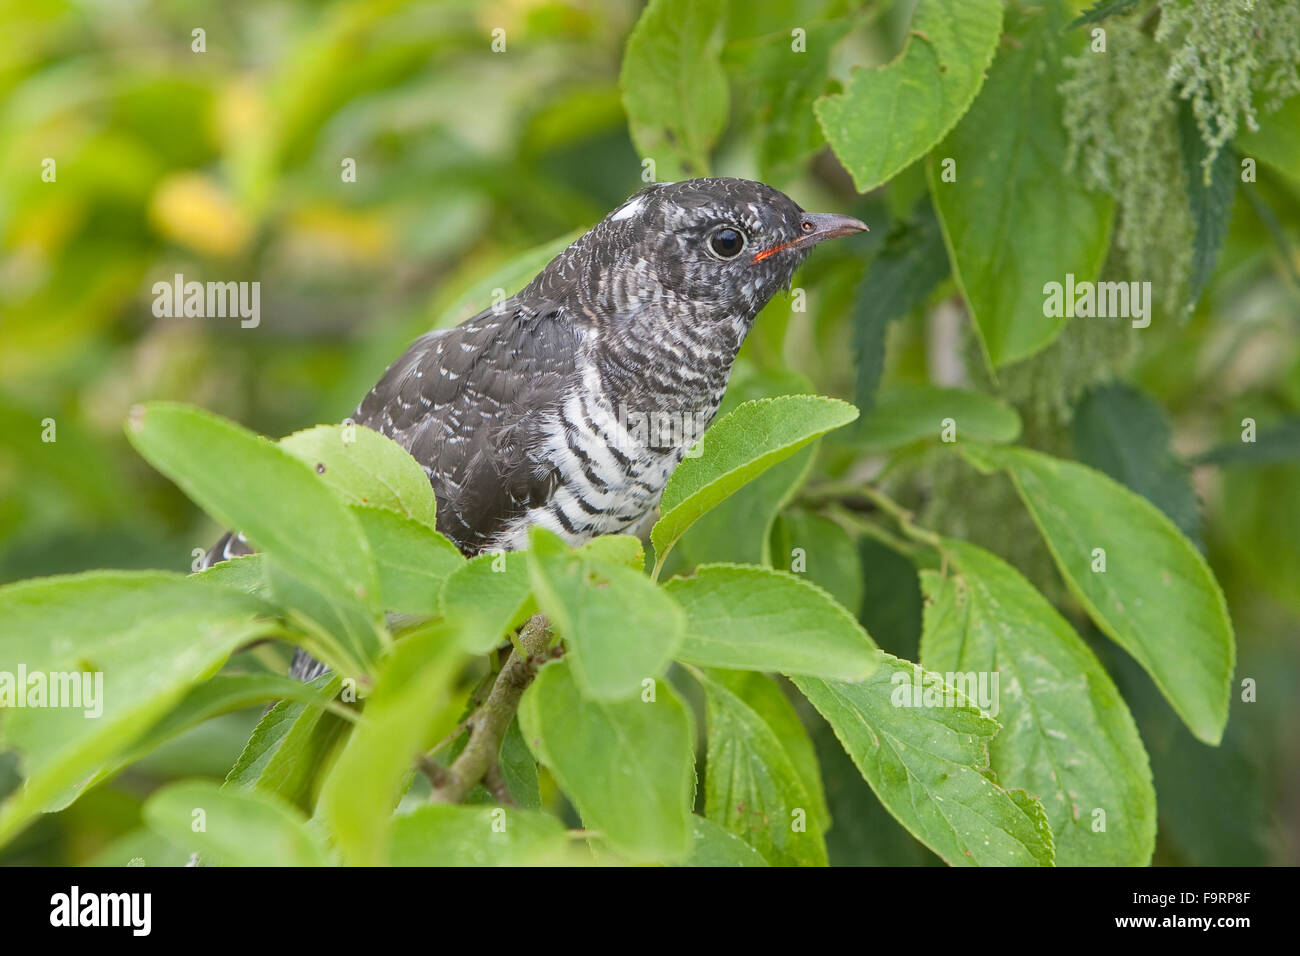 Cuckoo, young bird, Kuckuck, flügger Jungvogel, Cuculus canorus, Coucou gris - Stock Image